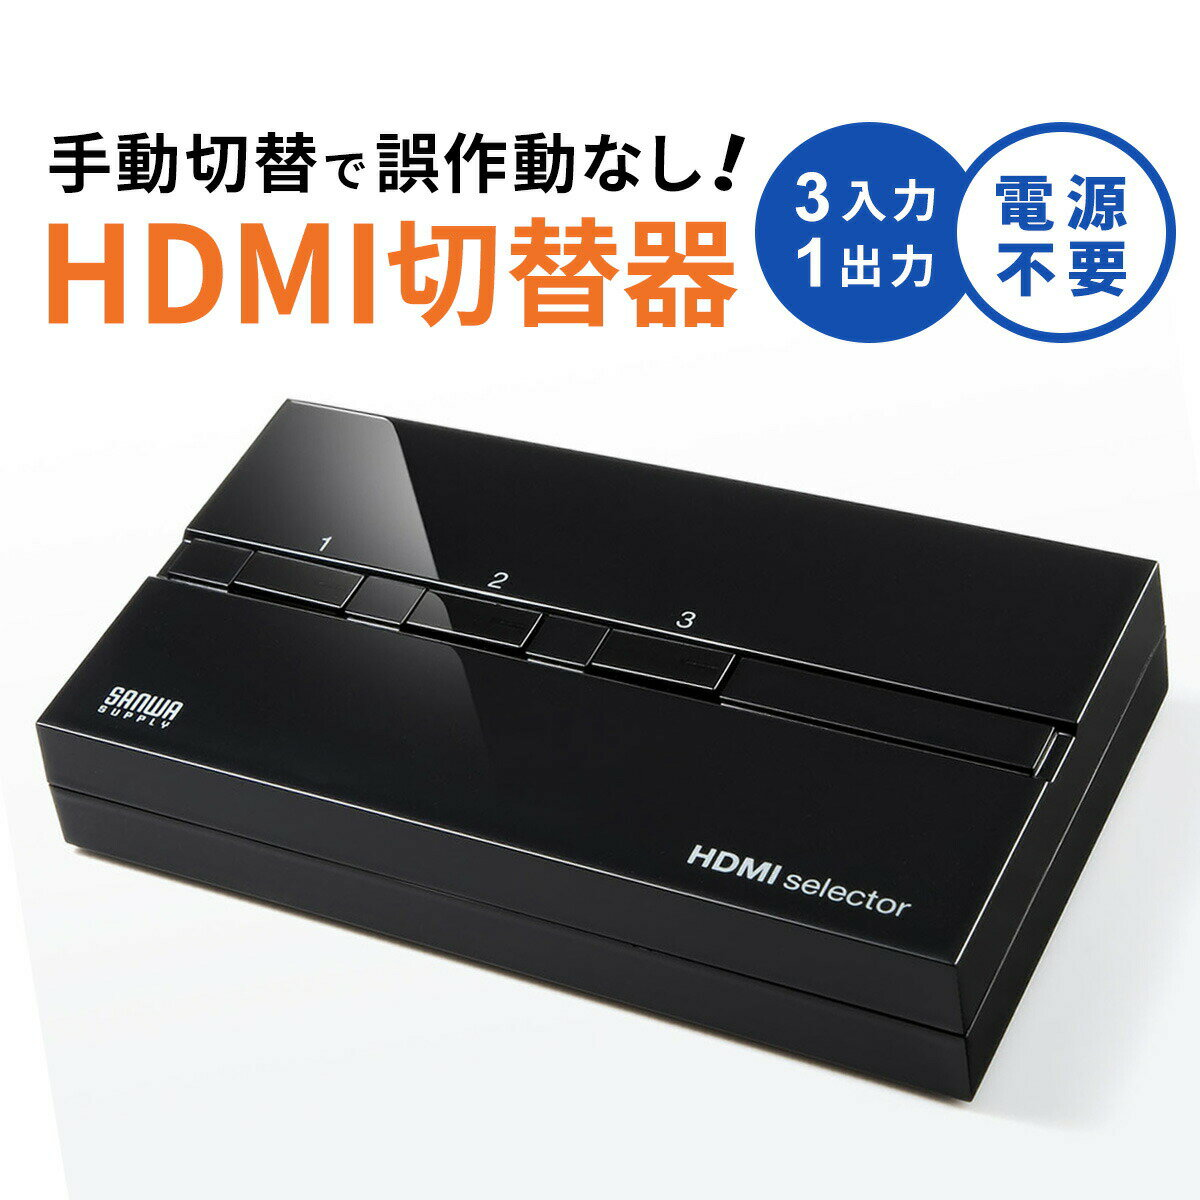 HDMI切替器 3入力1出力 PS4対応 3D対応 自動切り替えなし 手動切替 電源不要 HDCP対応 切替機 HDMI セレクター [400-SW018]【サンワダイレクト限定品】